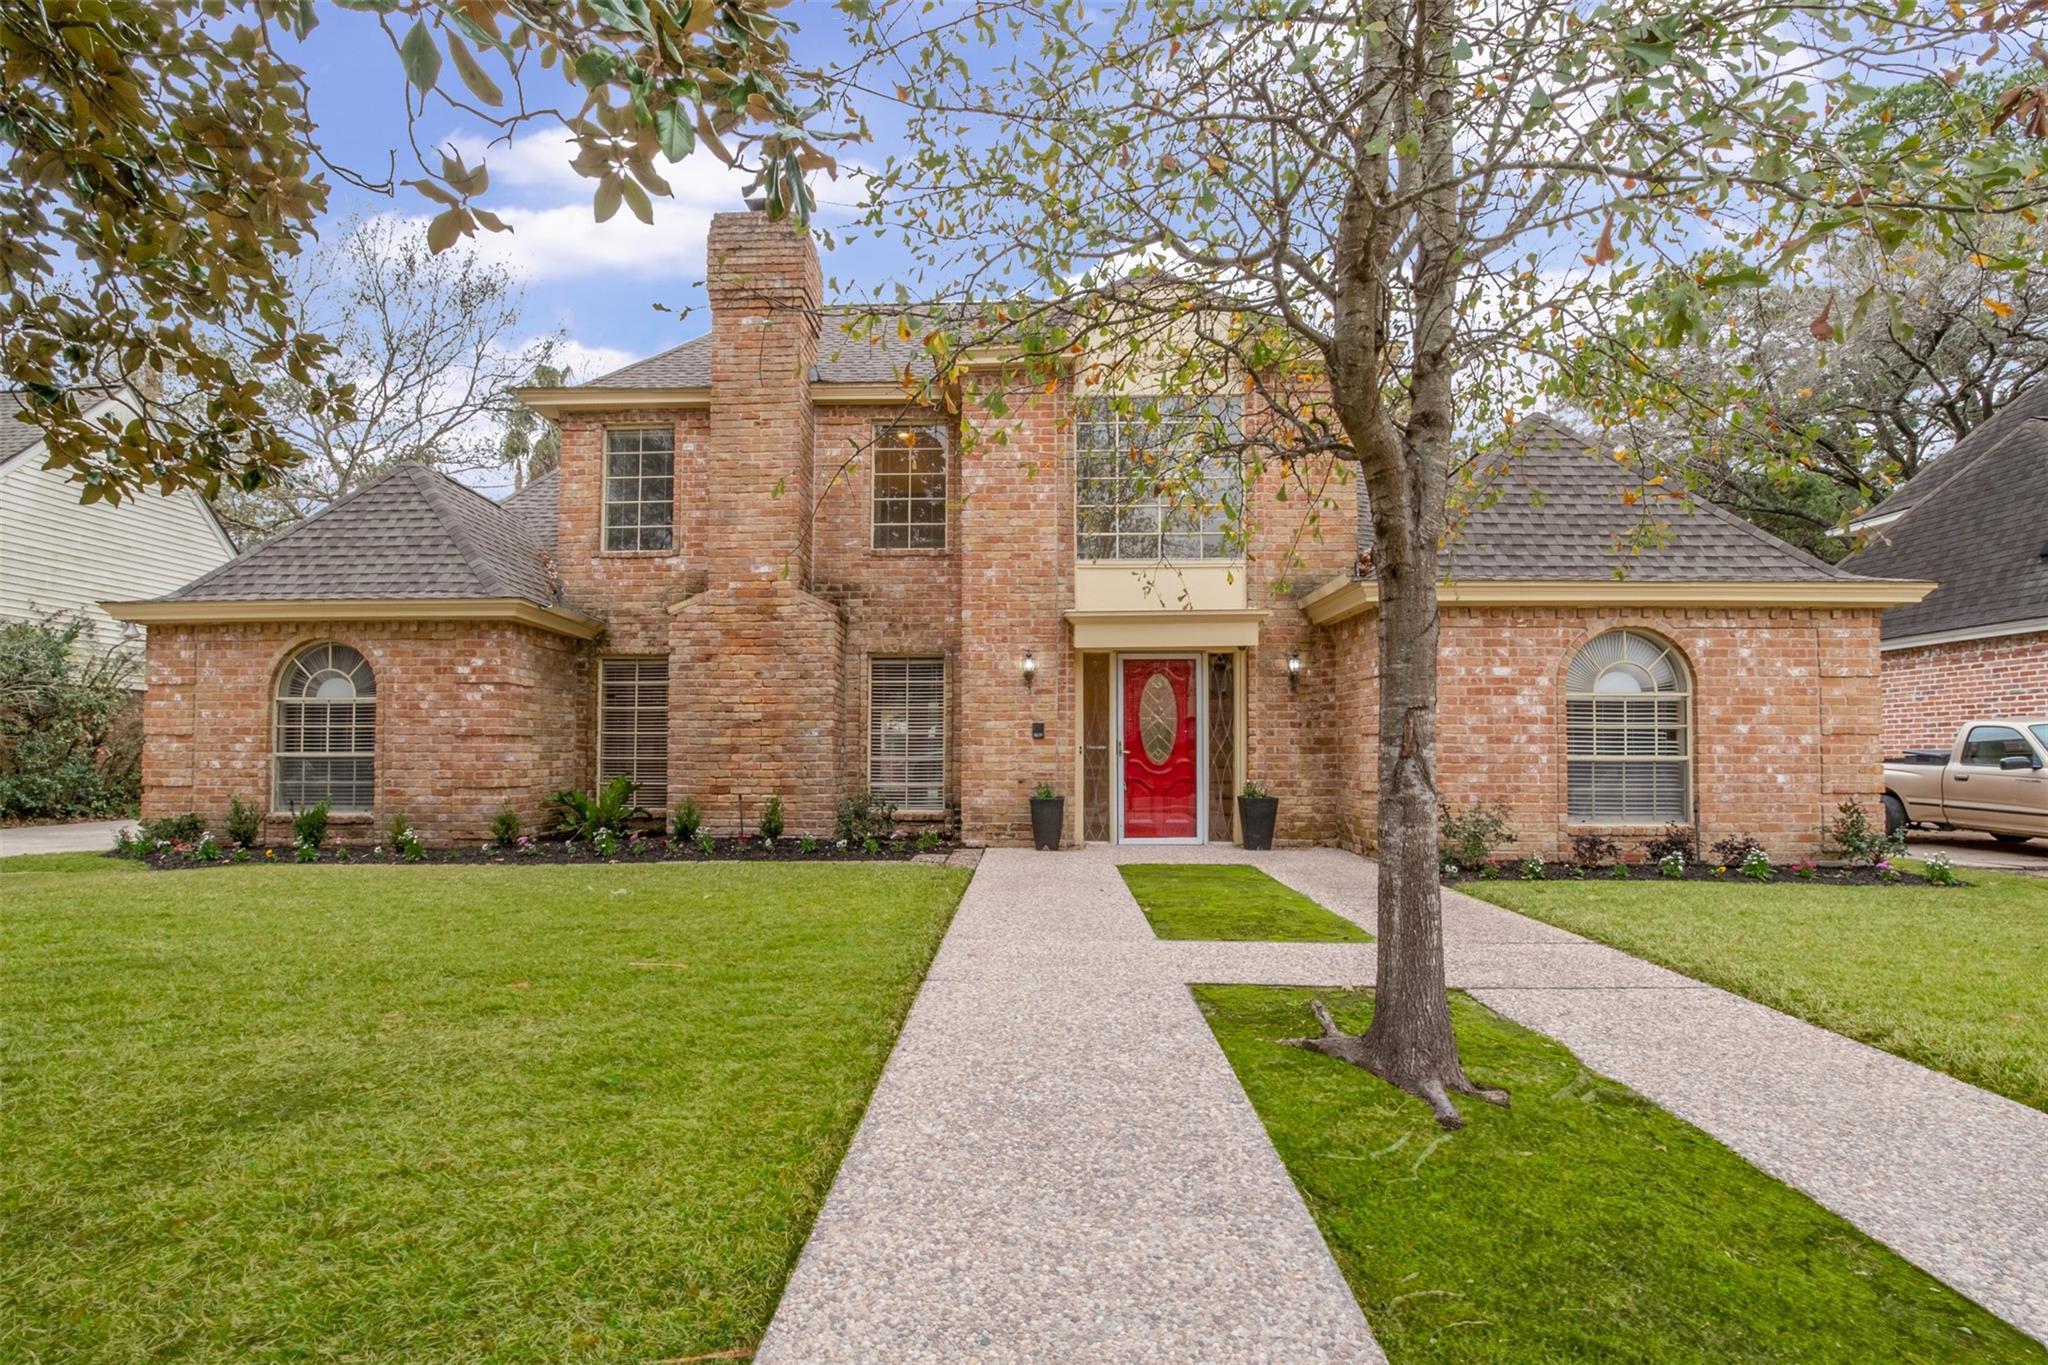 1830 Saddlecreek Drive Property Photo - Houston, TX real estate listing